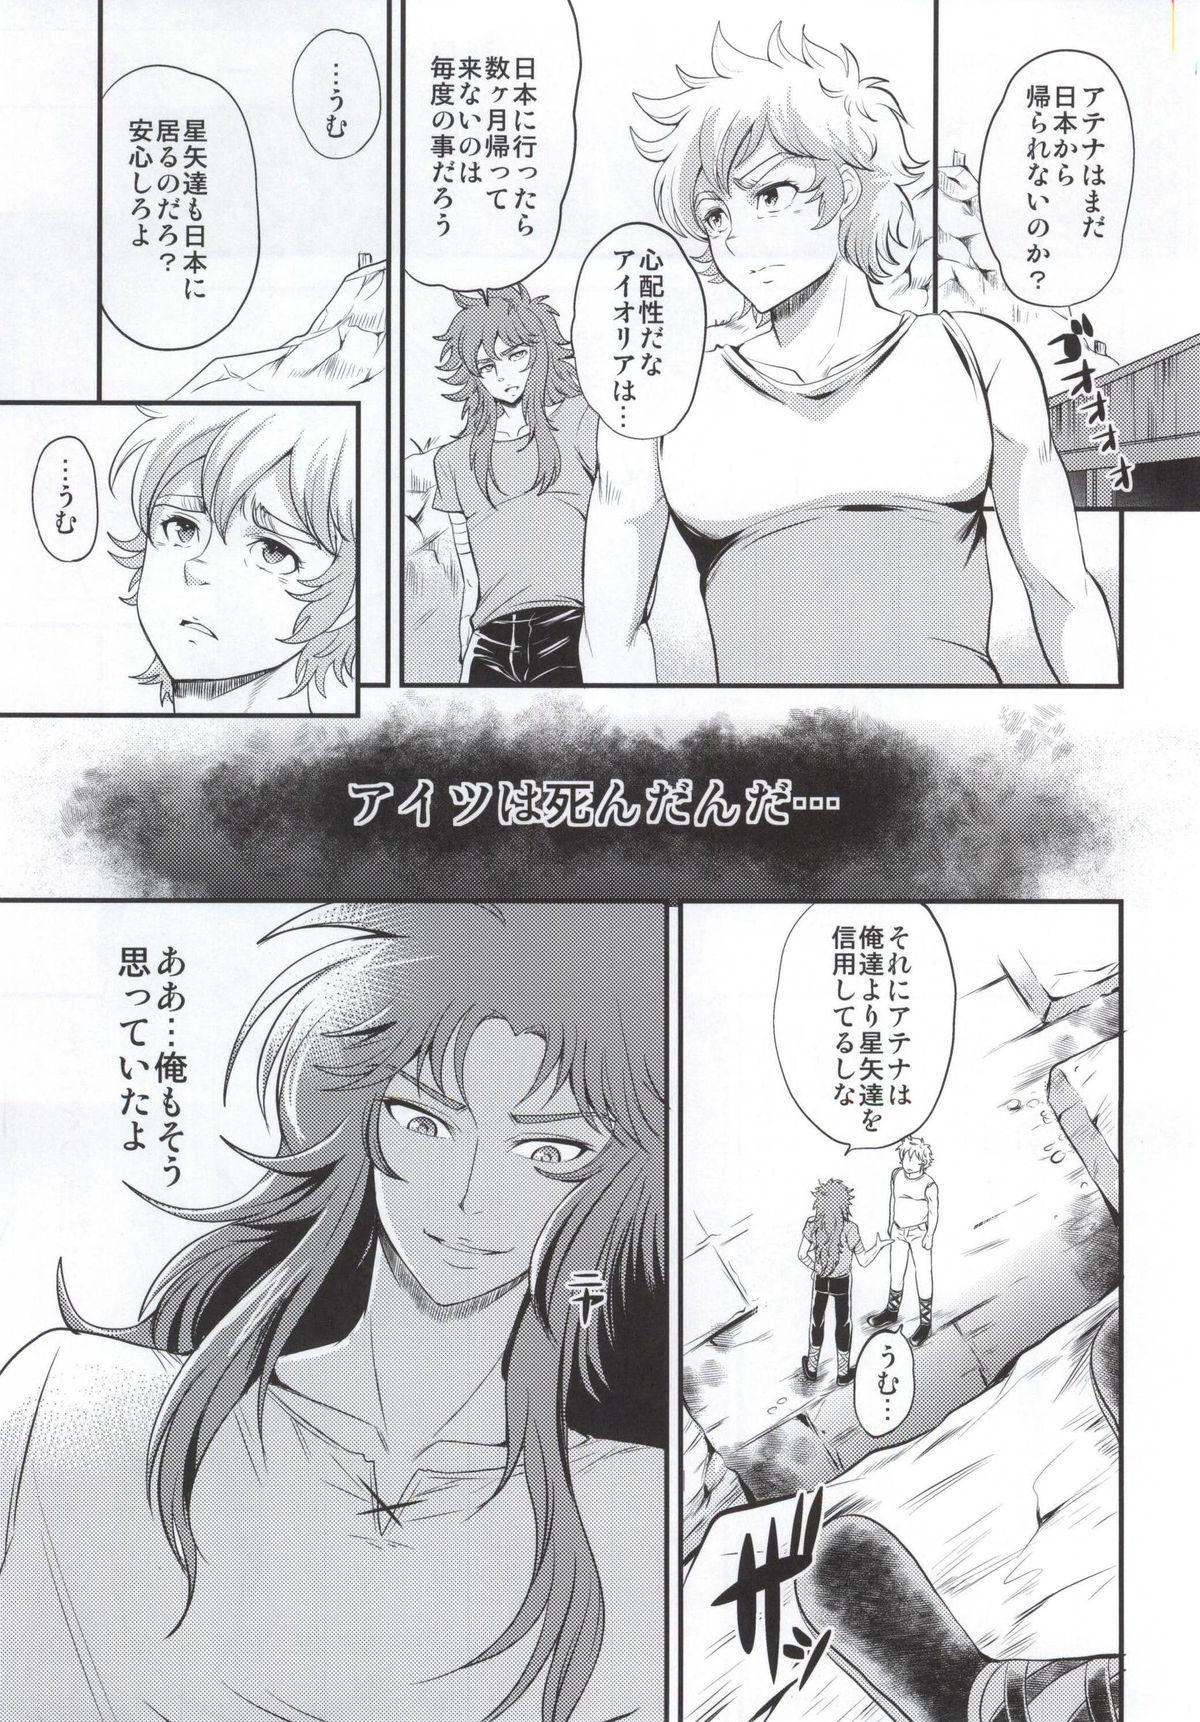 Kago no Naka no Megami 1